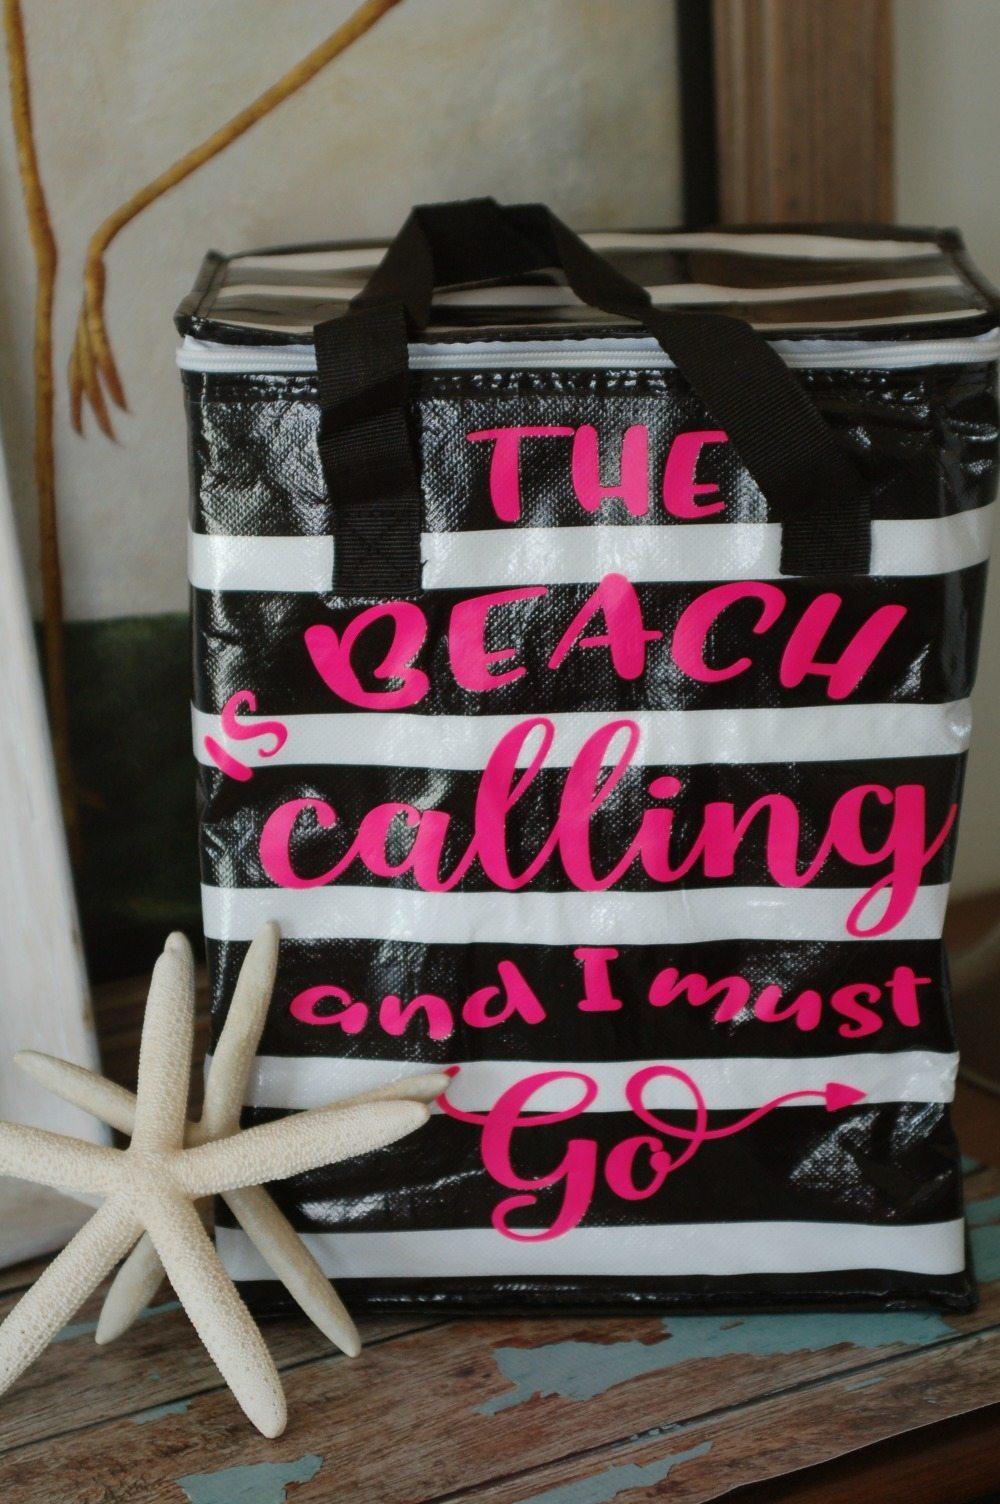 Insulated Walmart bag is now my beach bag